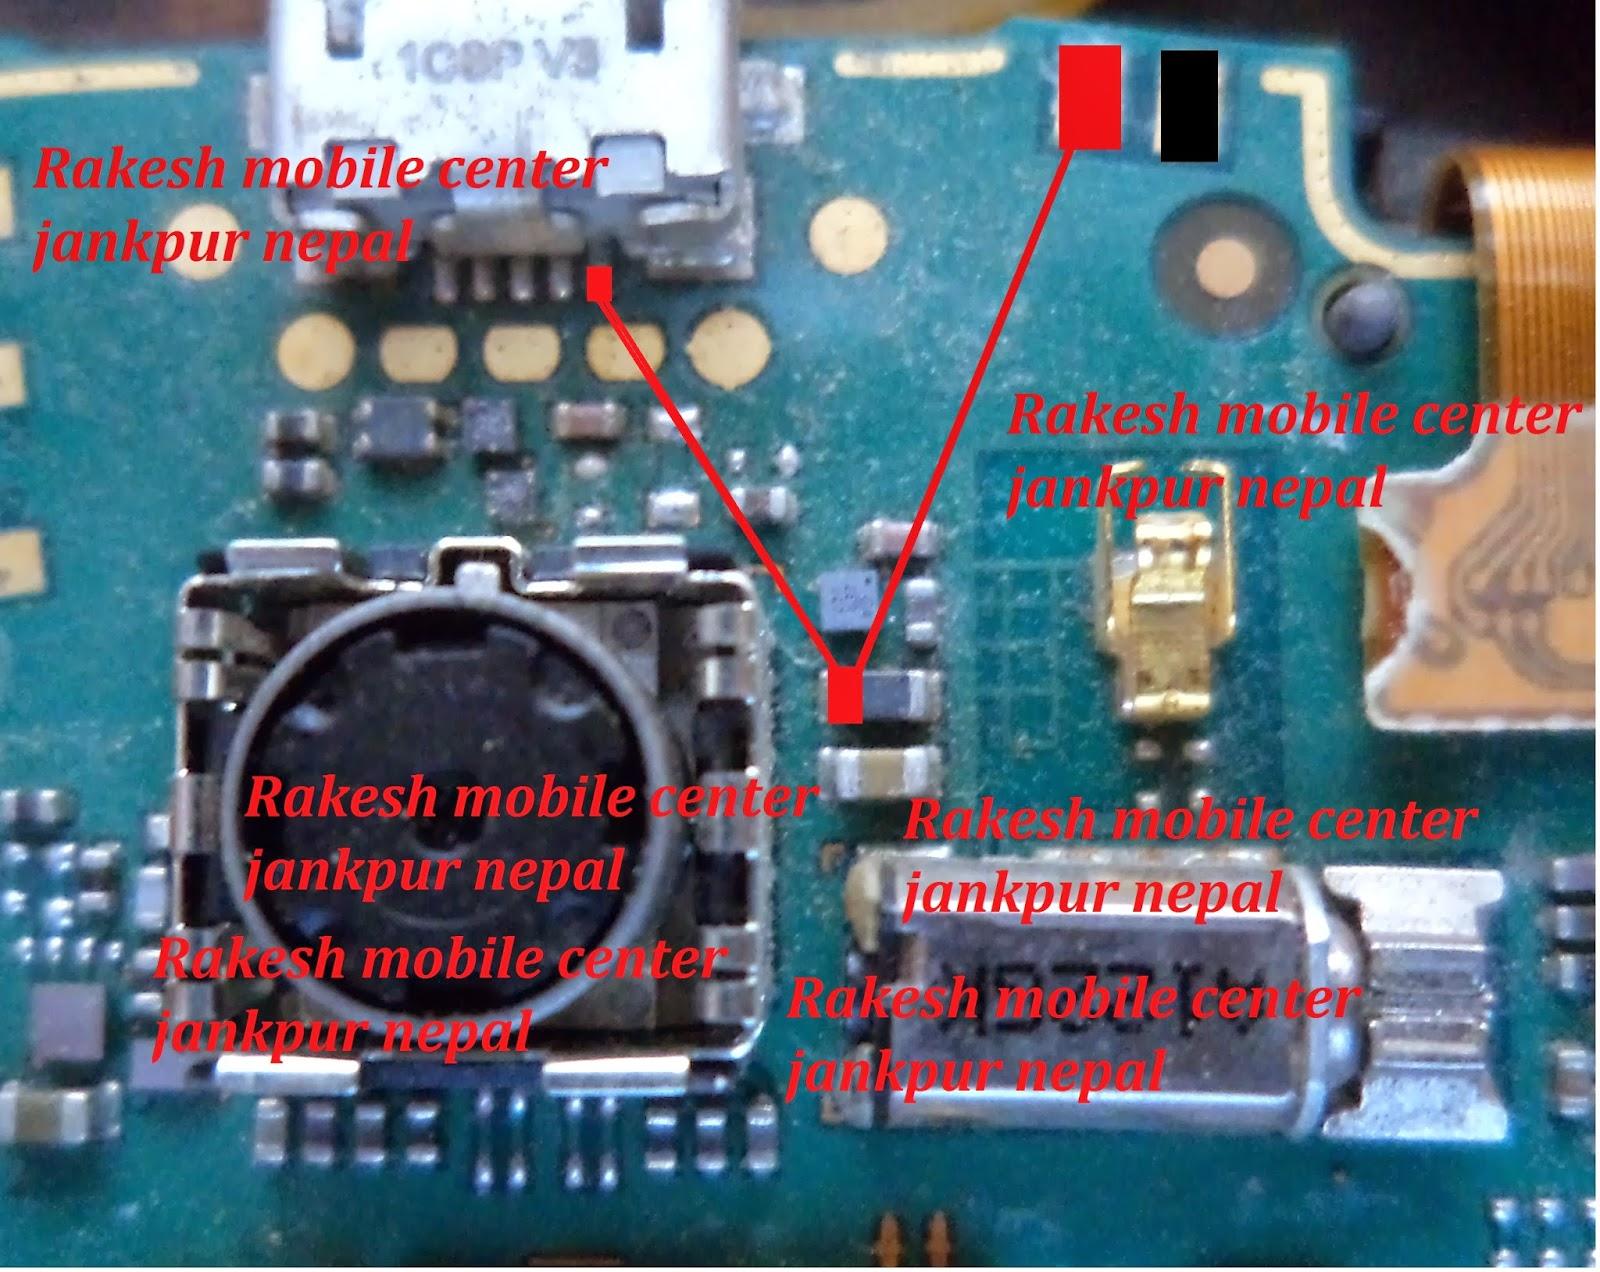 nokia 303 charging solution | Mobile Repairing Tips